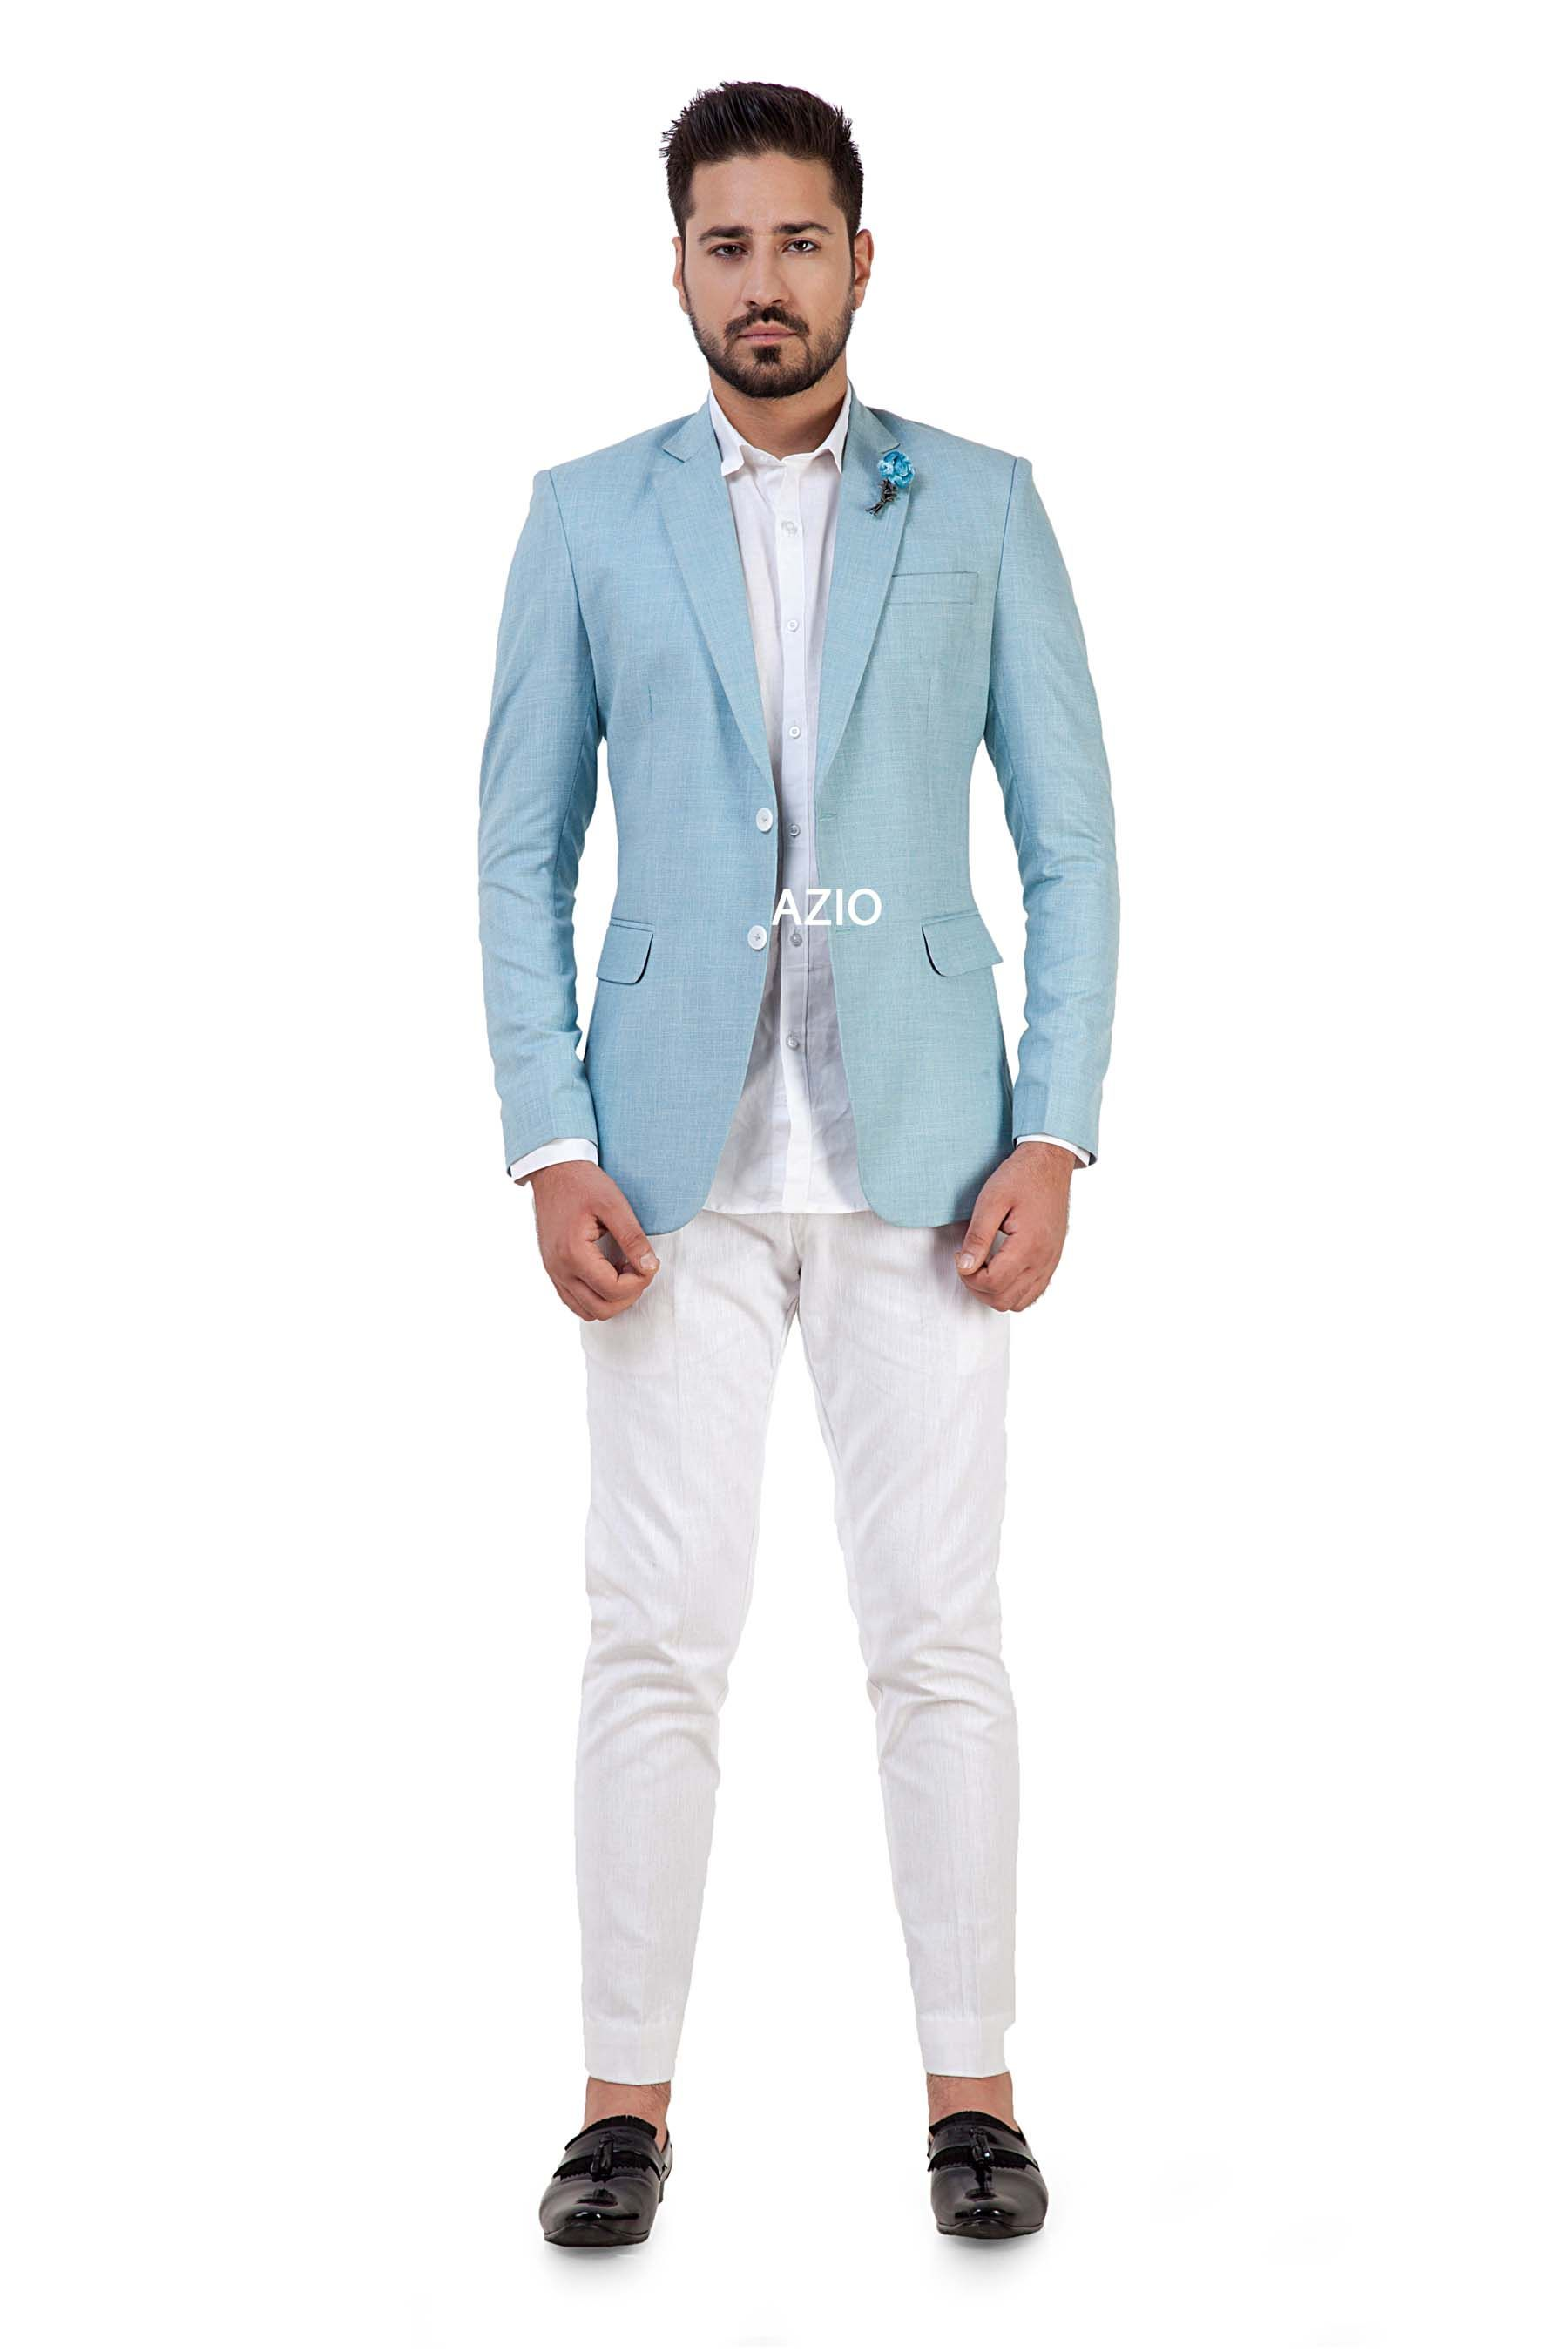 Azio sky blue linen blazer wedding suits men blazers